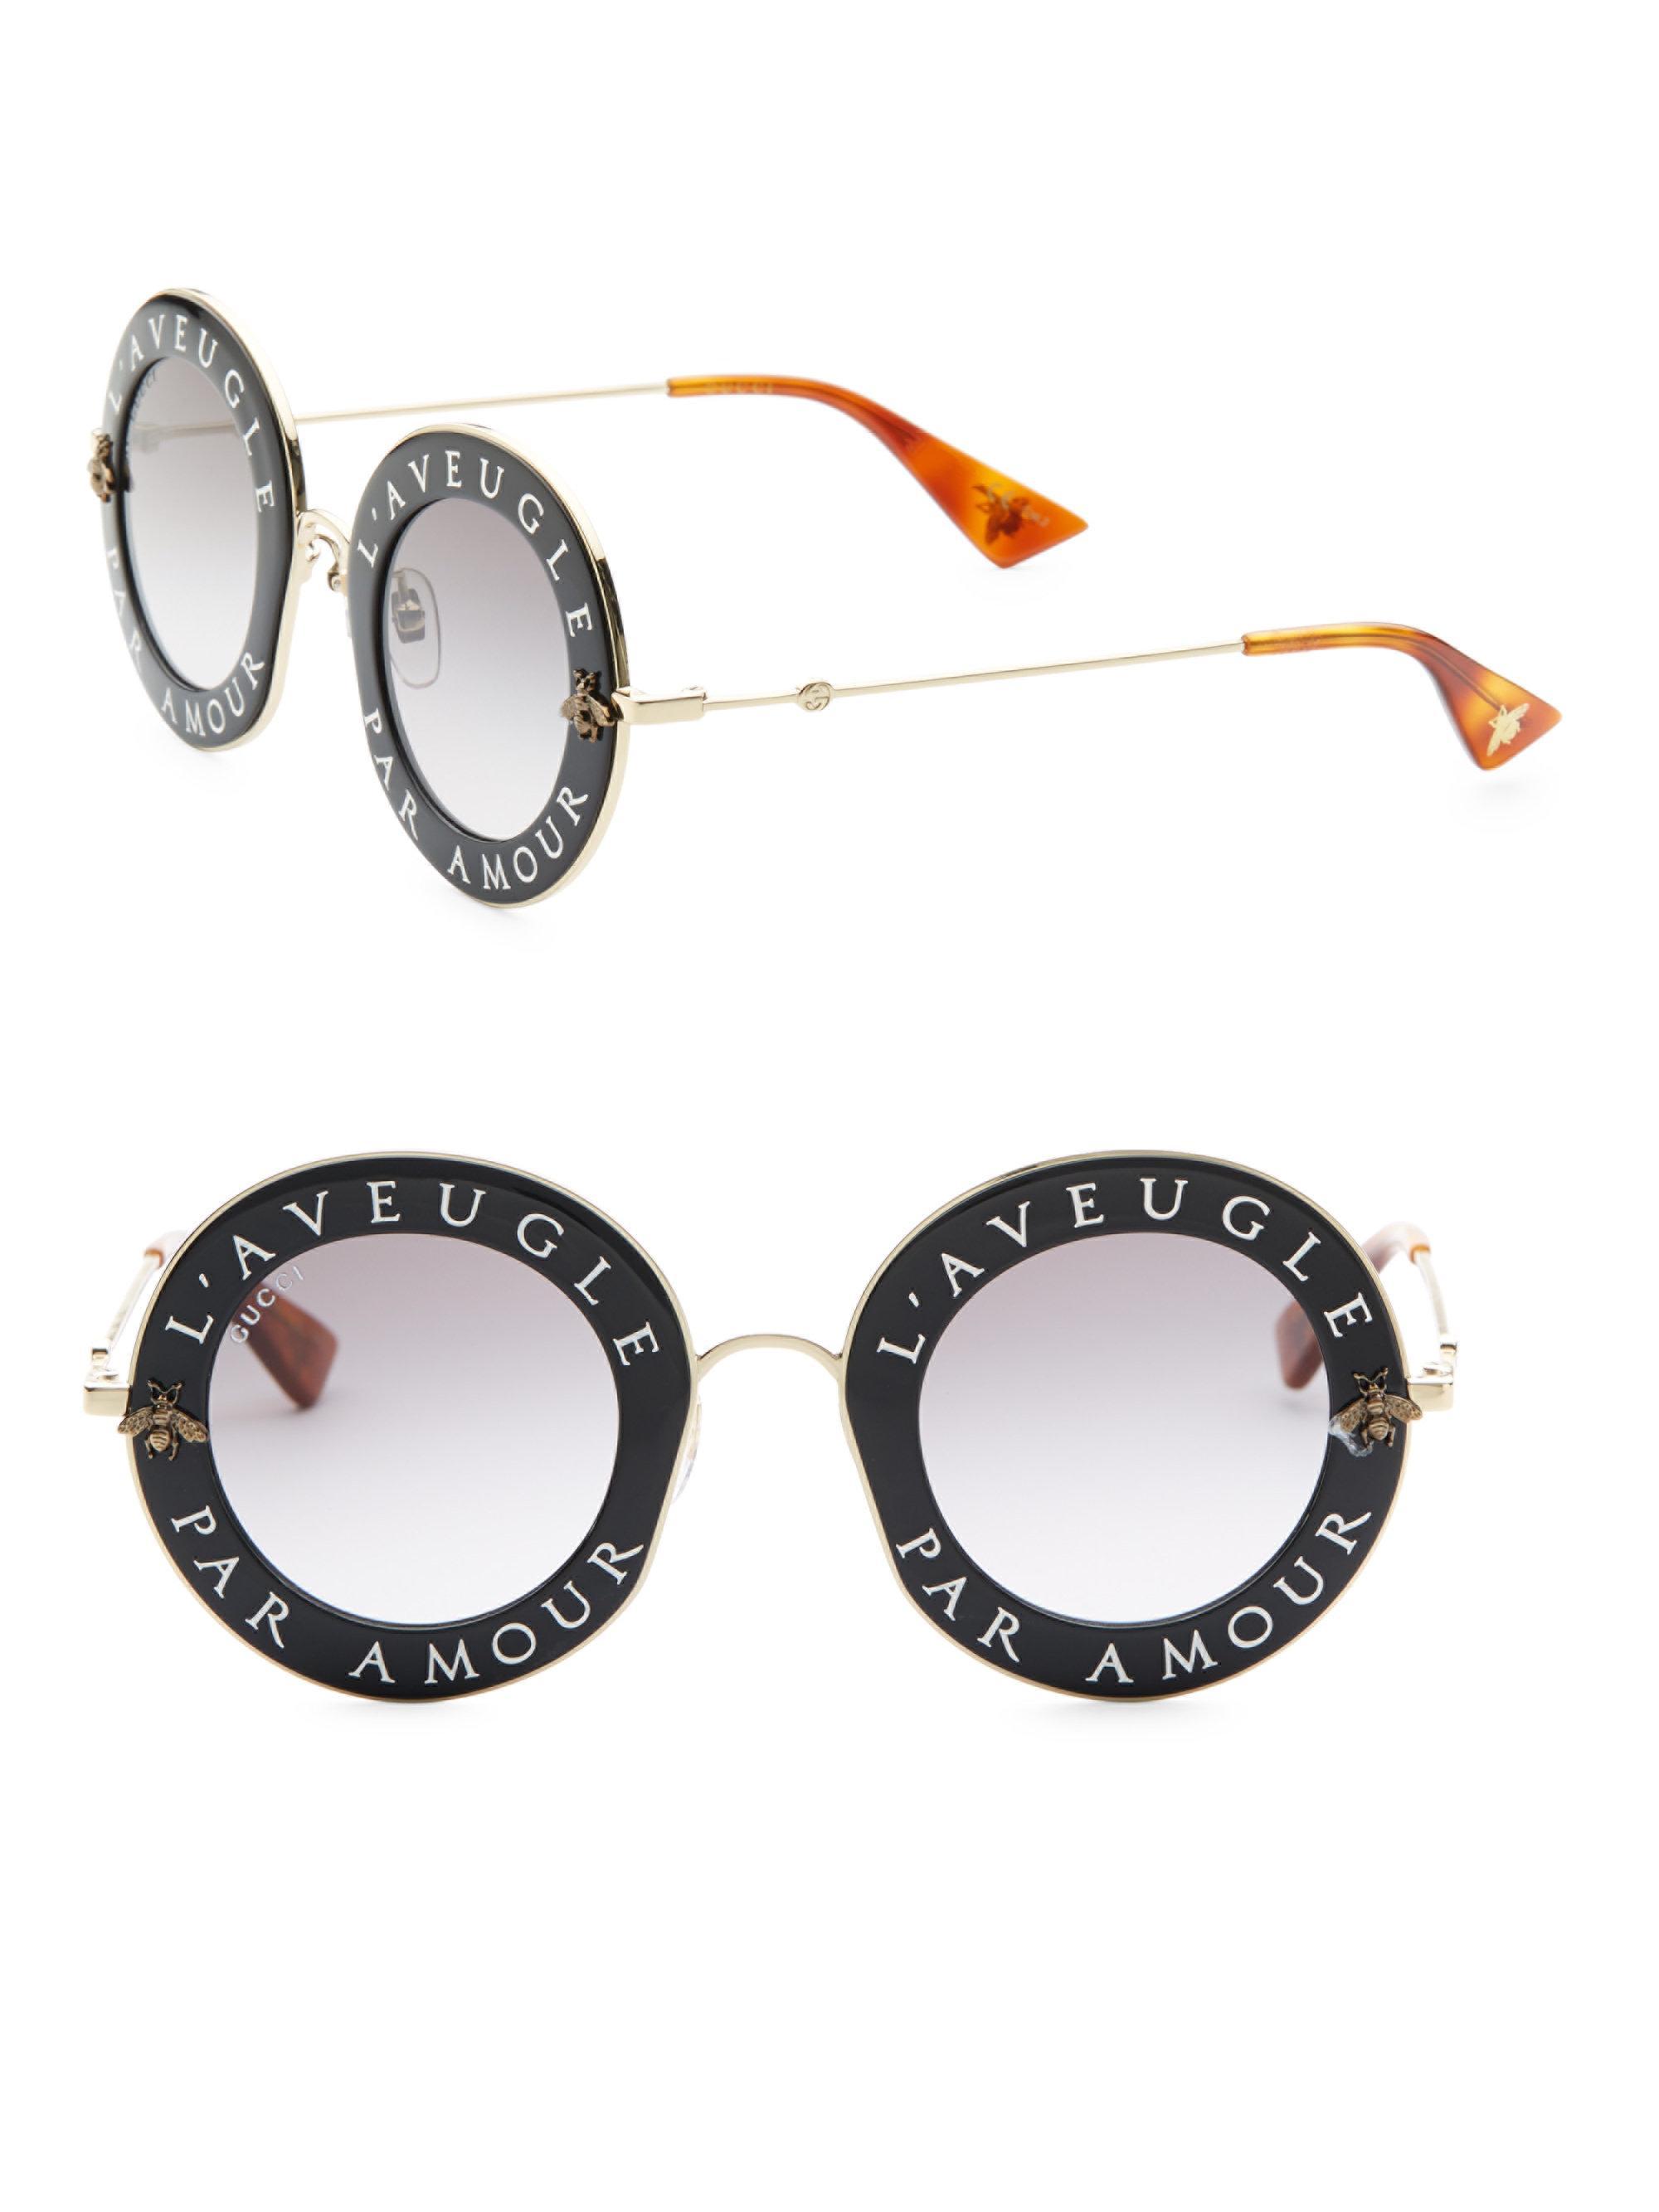 3503f766c6d Lyst - Gucci 44mm L aveugle Par Amour Round Sunglasses in Black